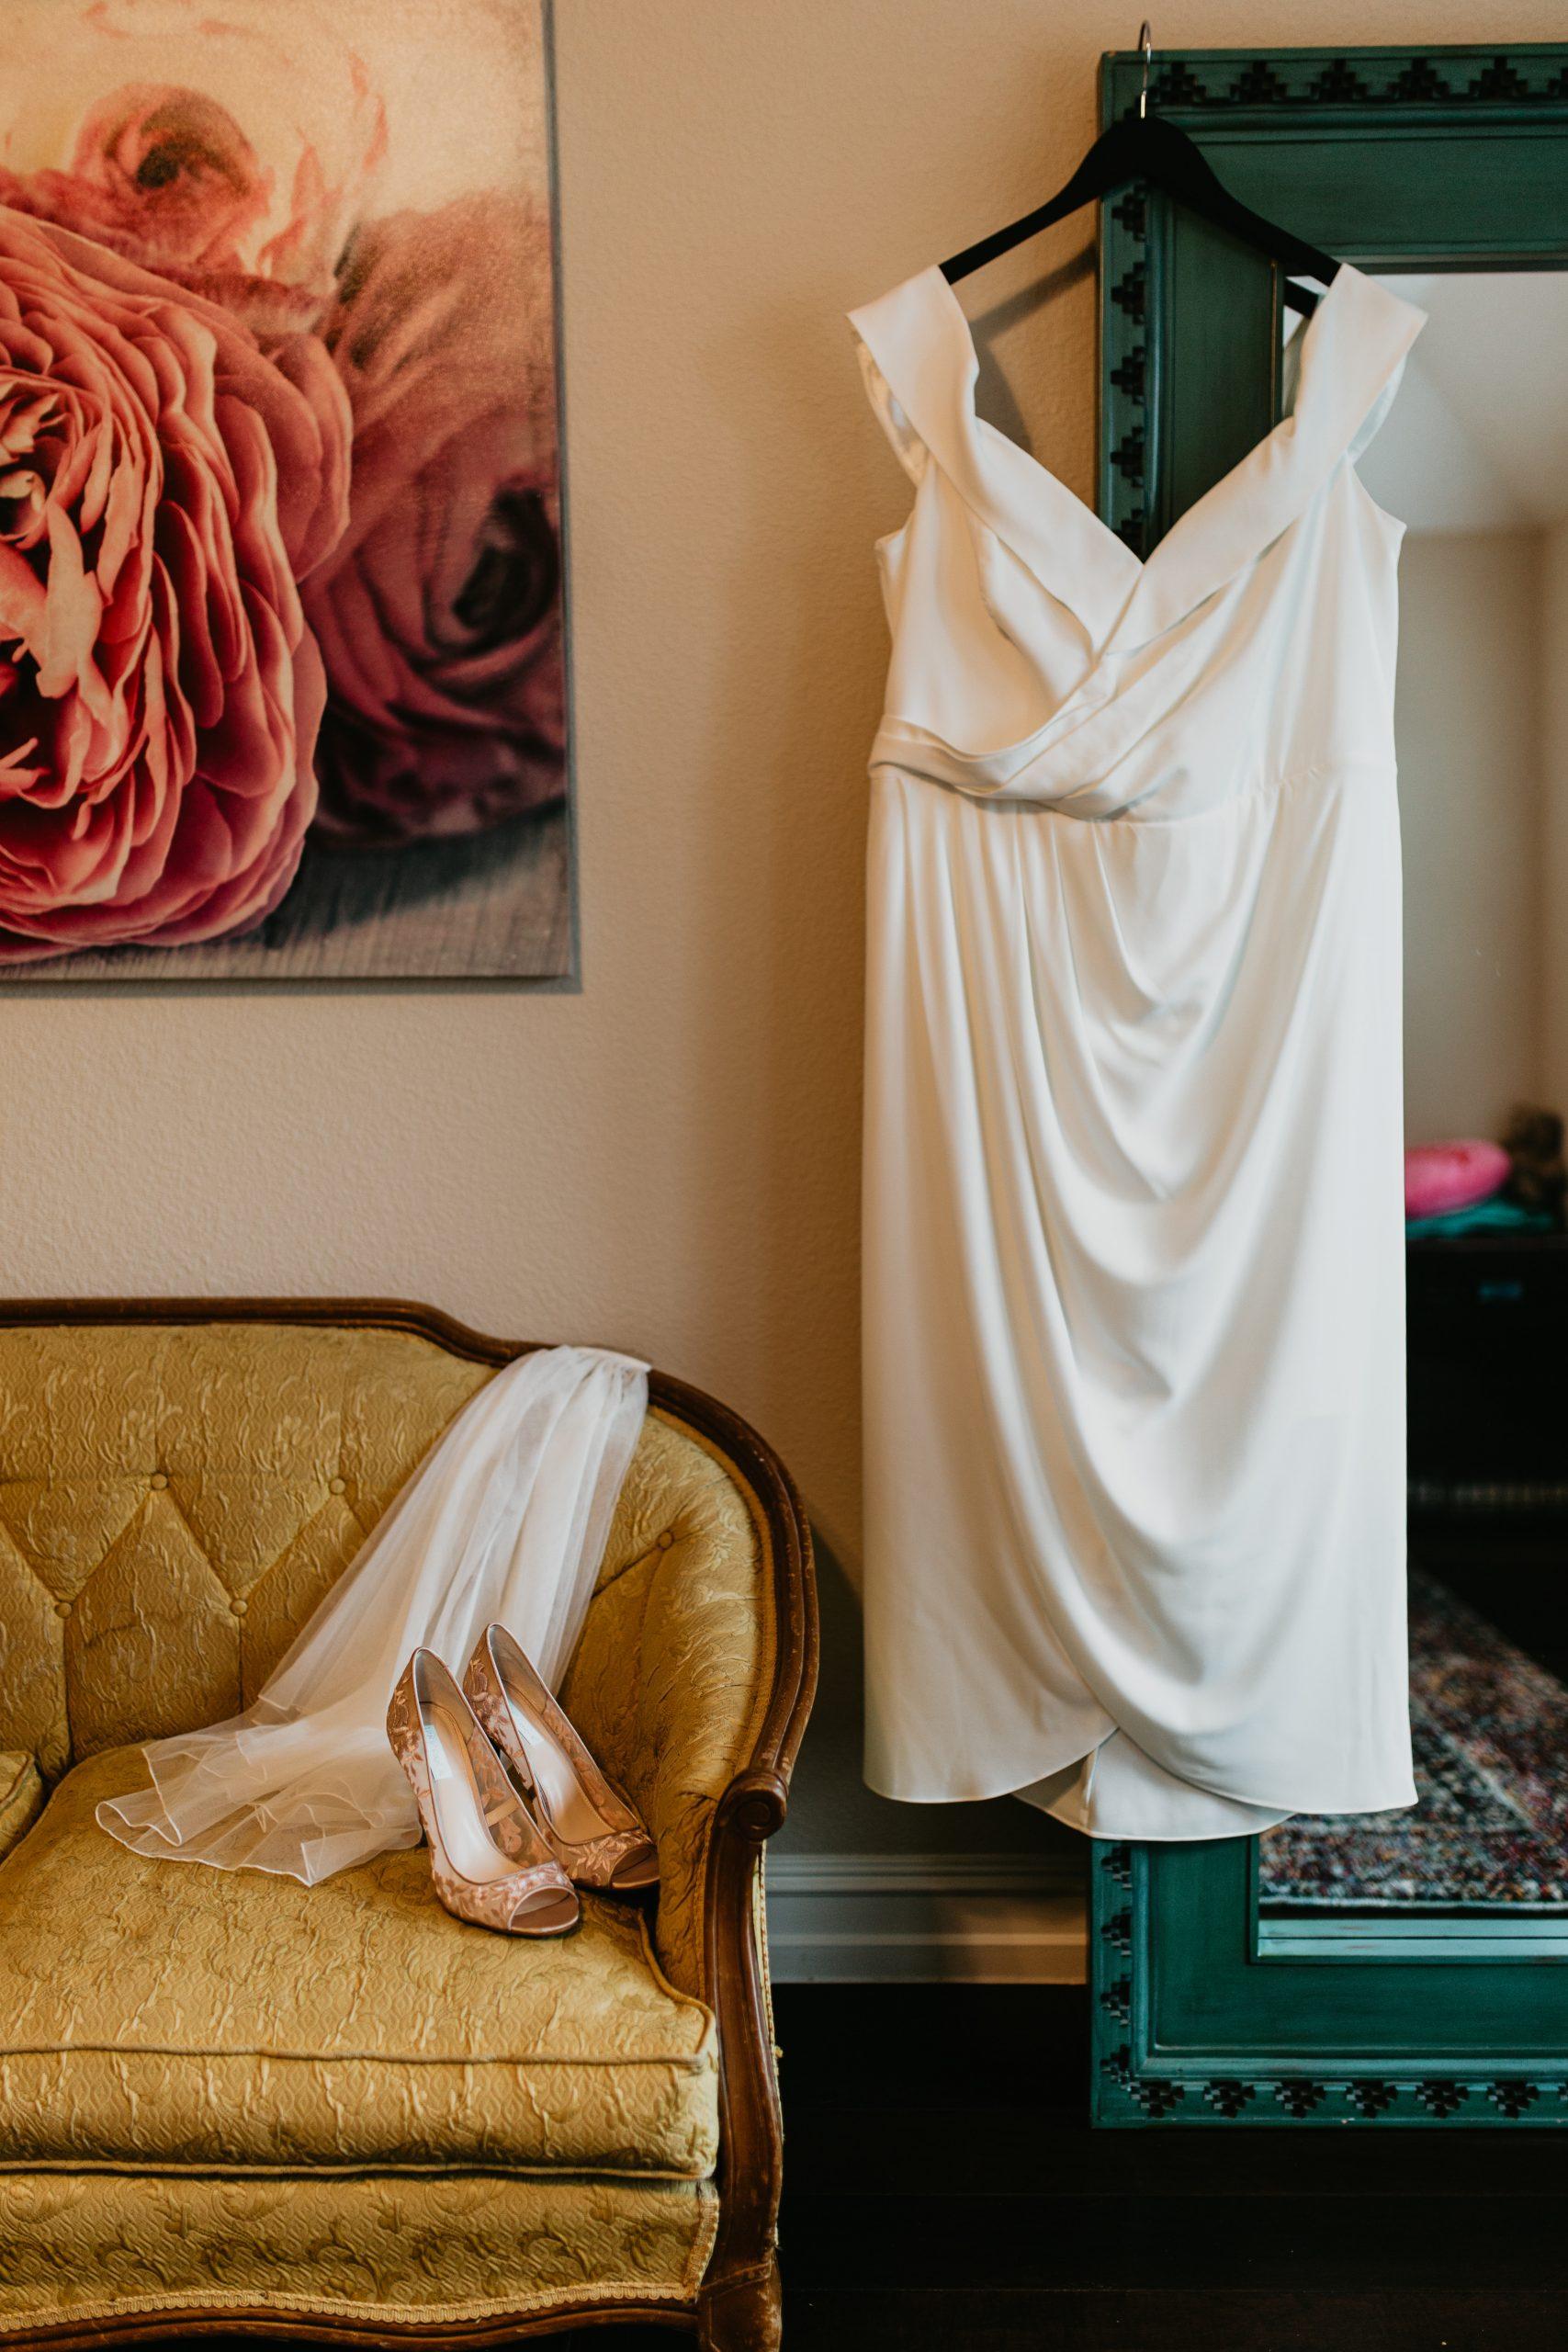 Meme Urbane Photography - Bride Details - McKinney Texas -Micro Wedding Details - Intimate Wedding - Simple Wedding Dress